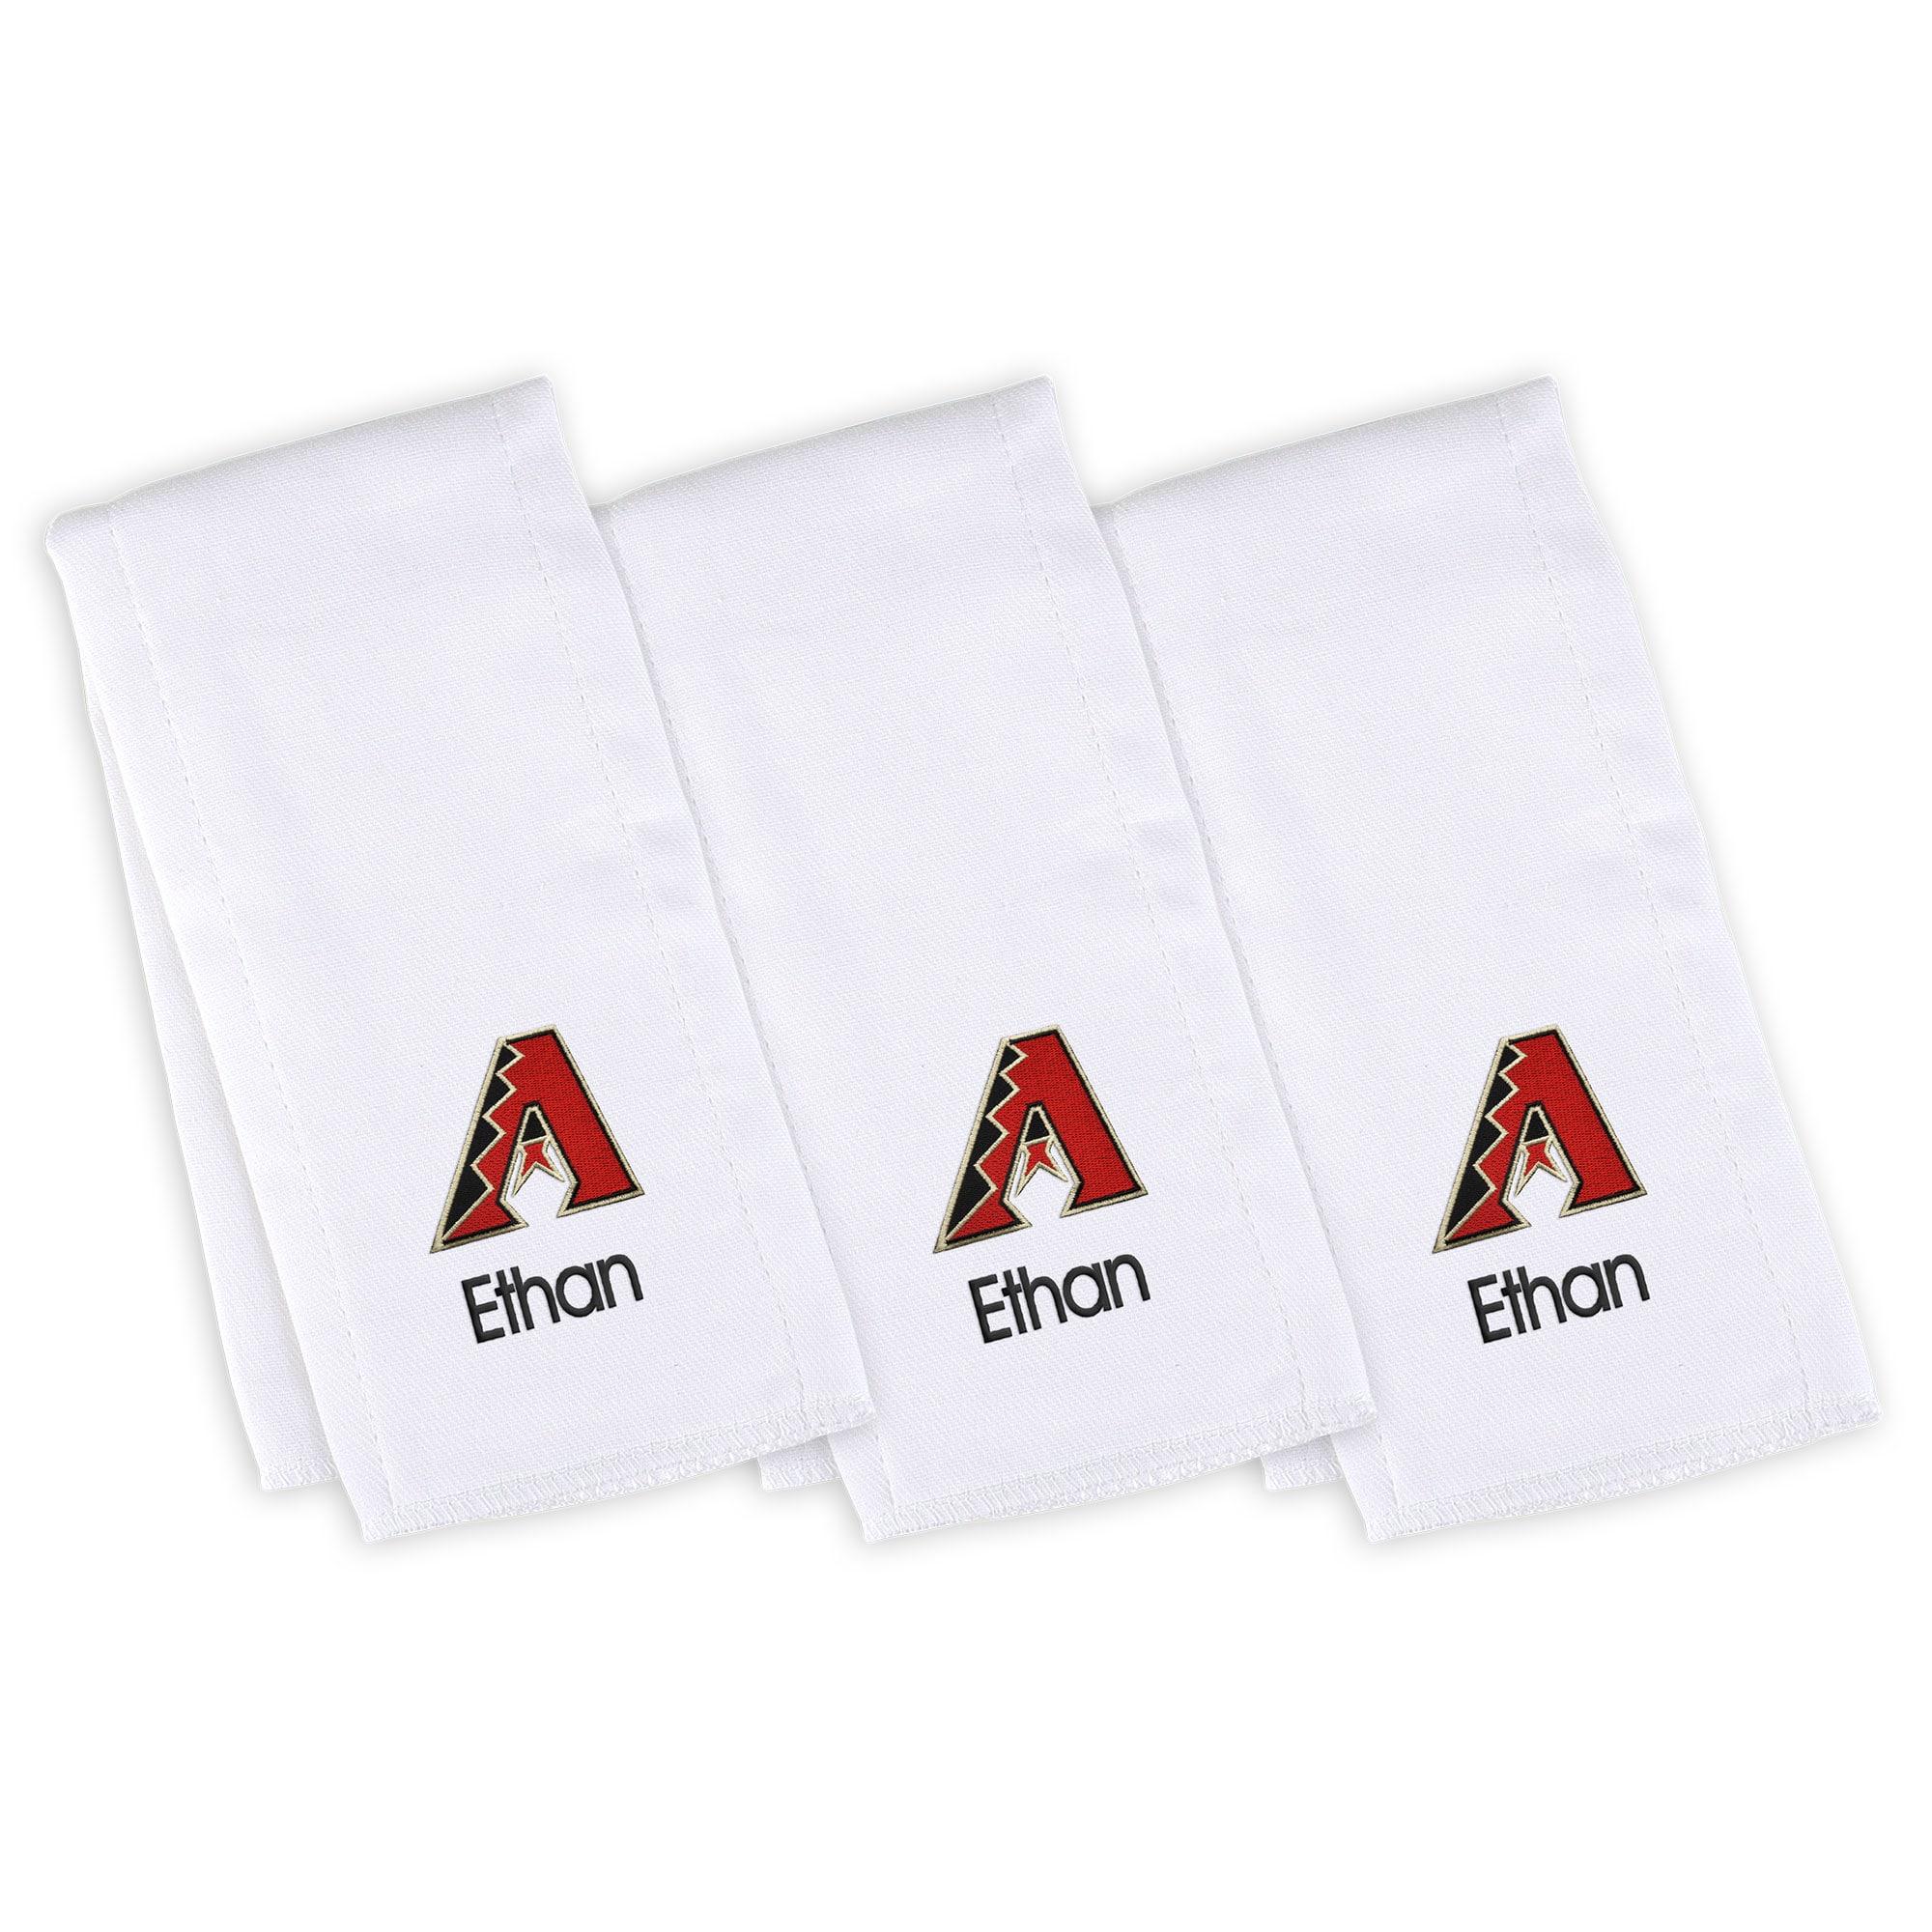 Arizona Diamondbacks Infant Personalized Burp Cloth 3-Pack - White